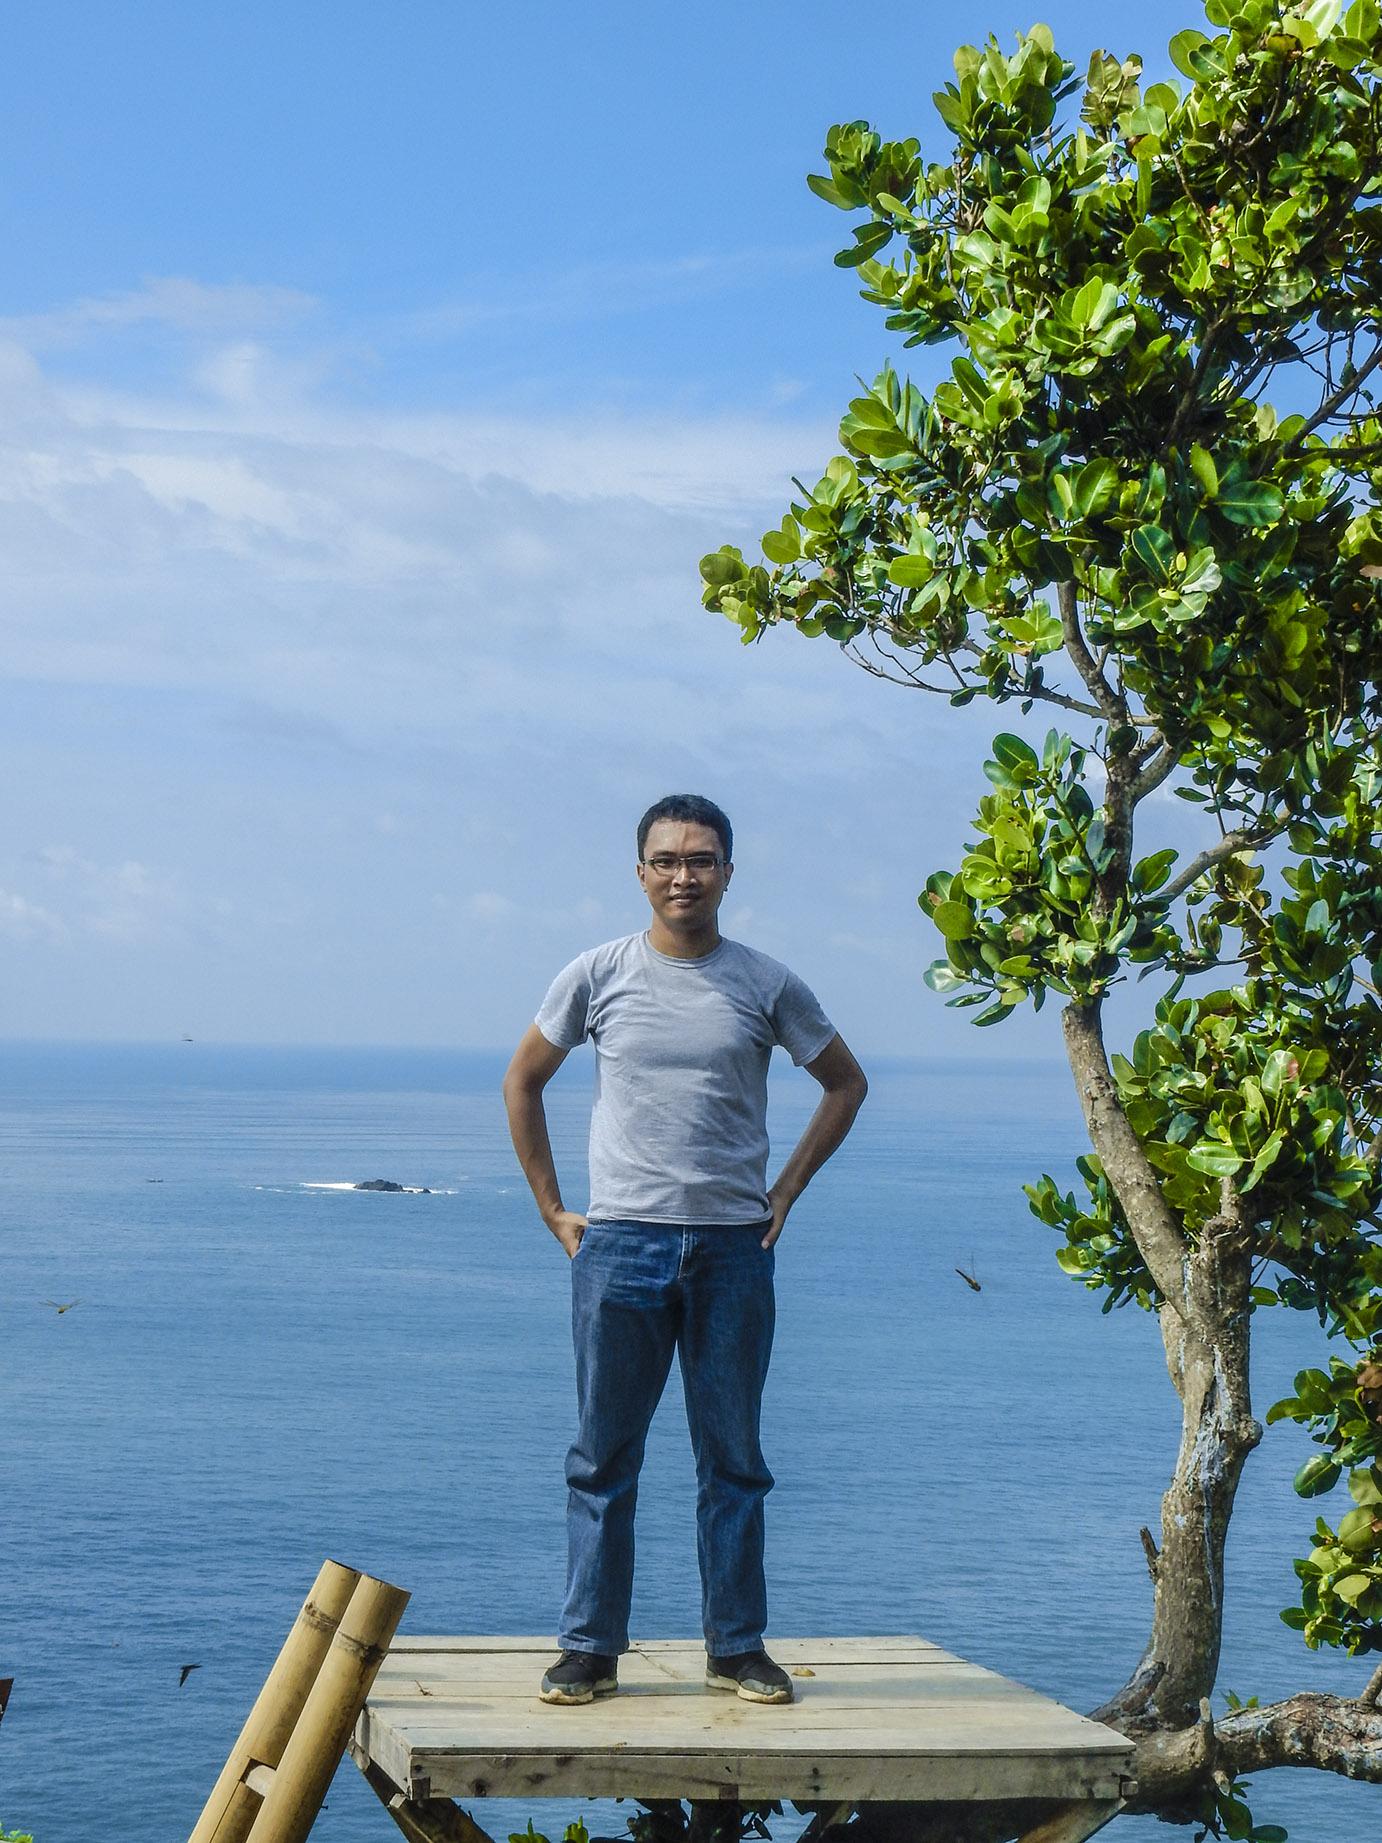 akses jalan menuju pantai patemon pantai watu pawon di kebumen